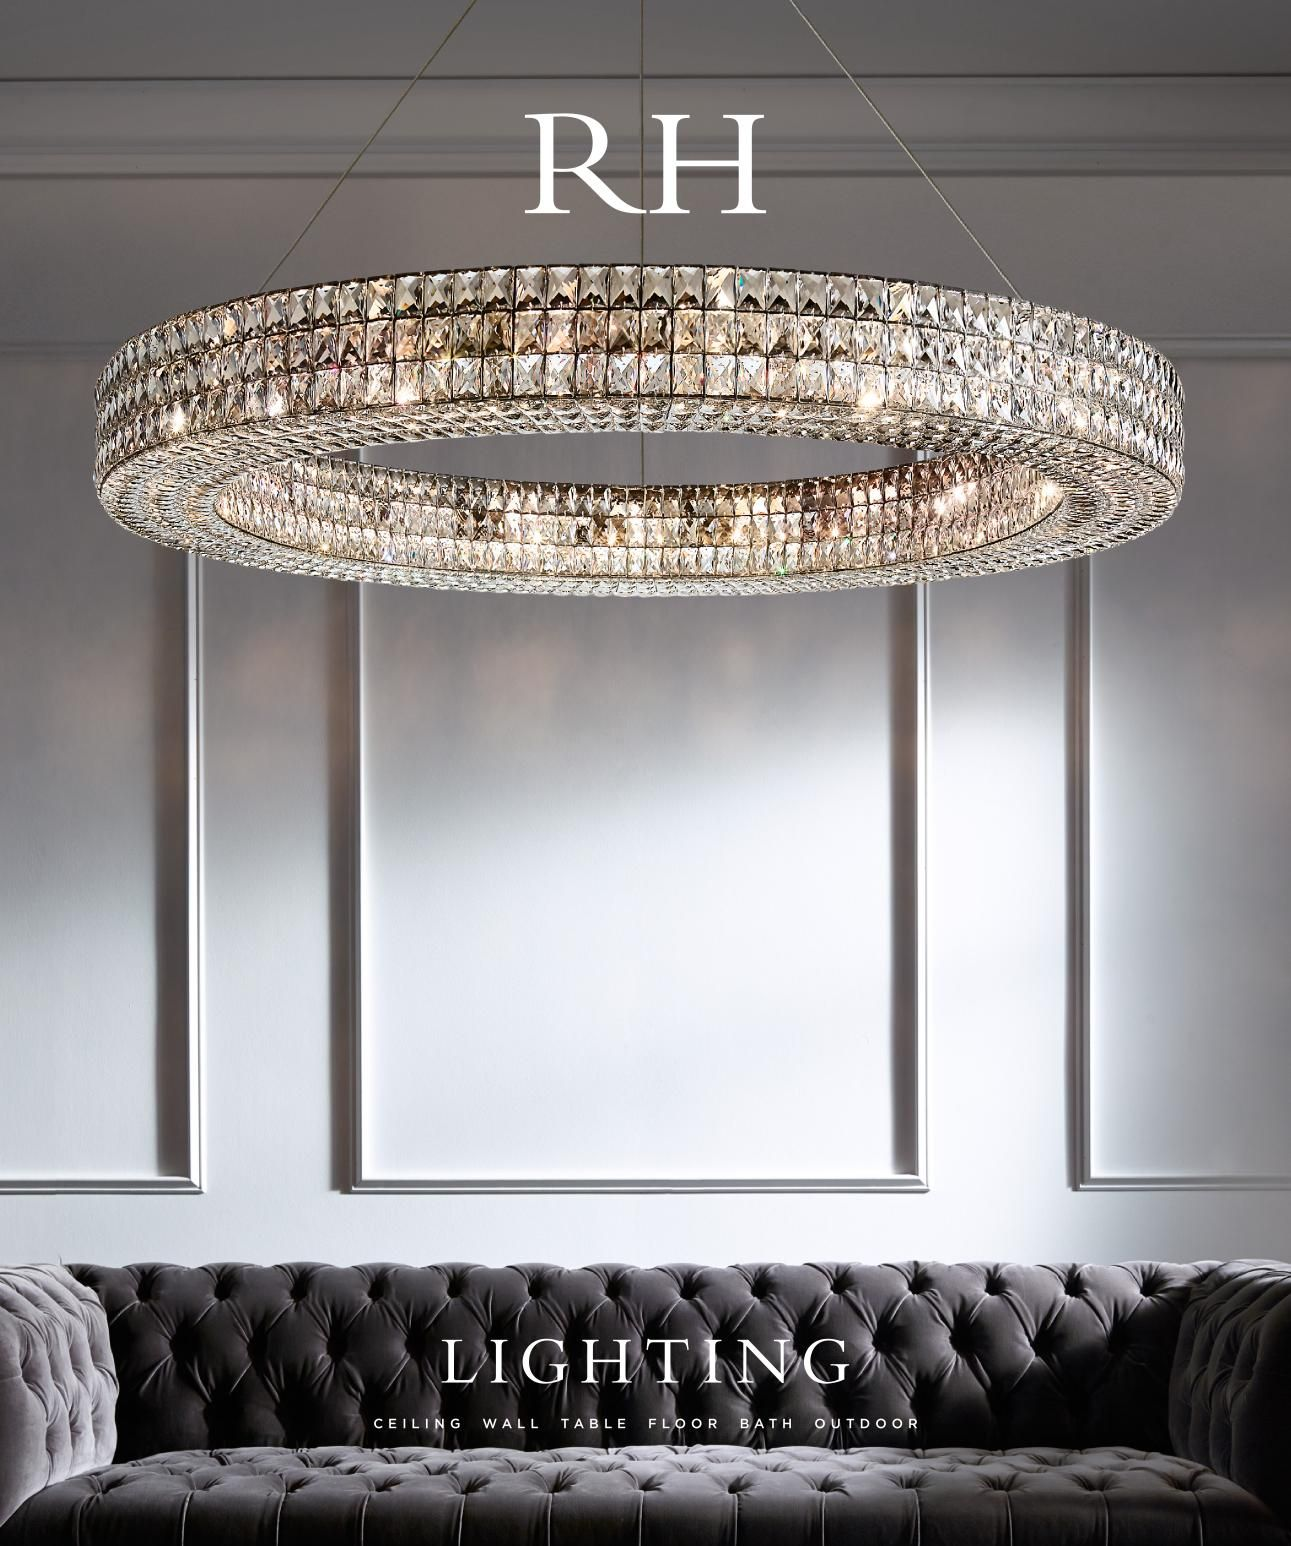 Restoration hardware lighting 吊灯 pinterest beautiful life